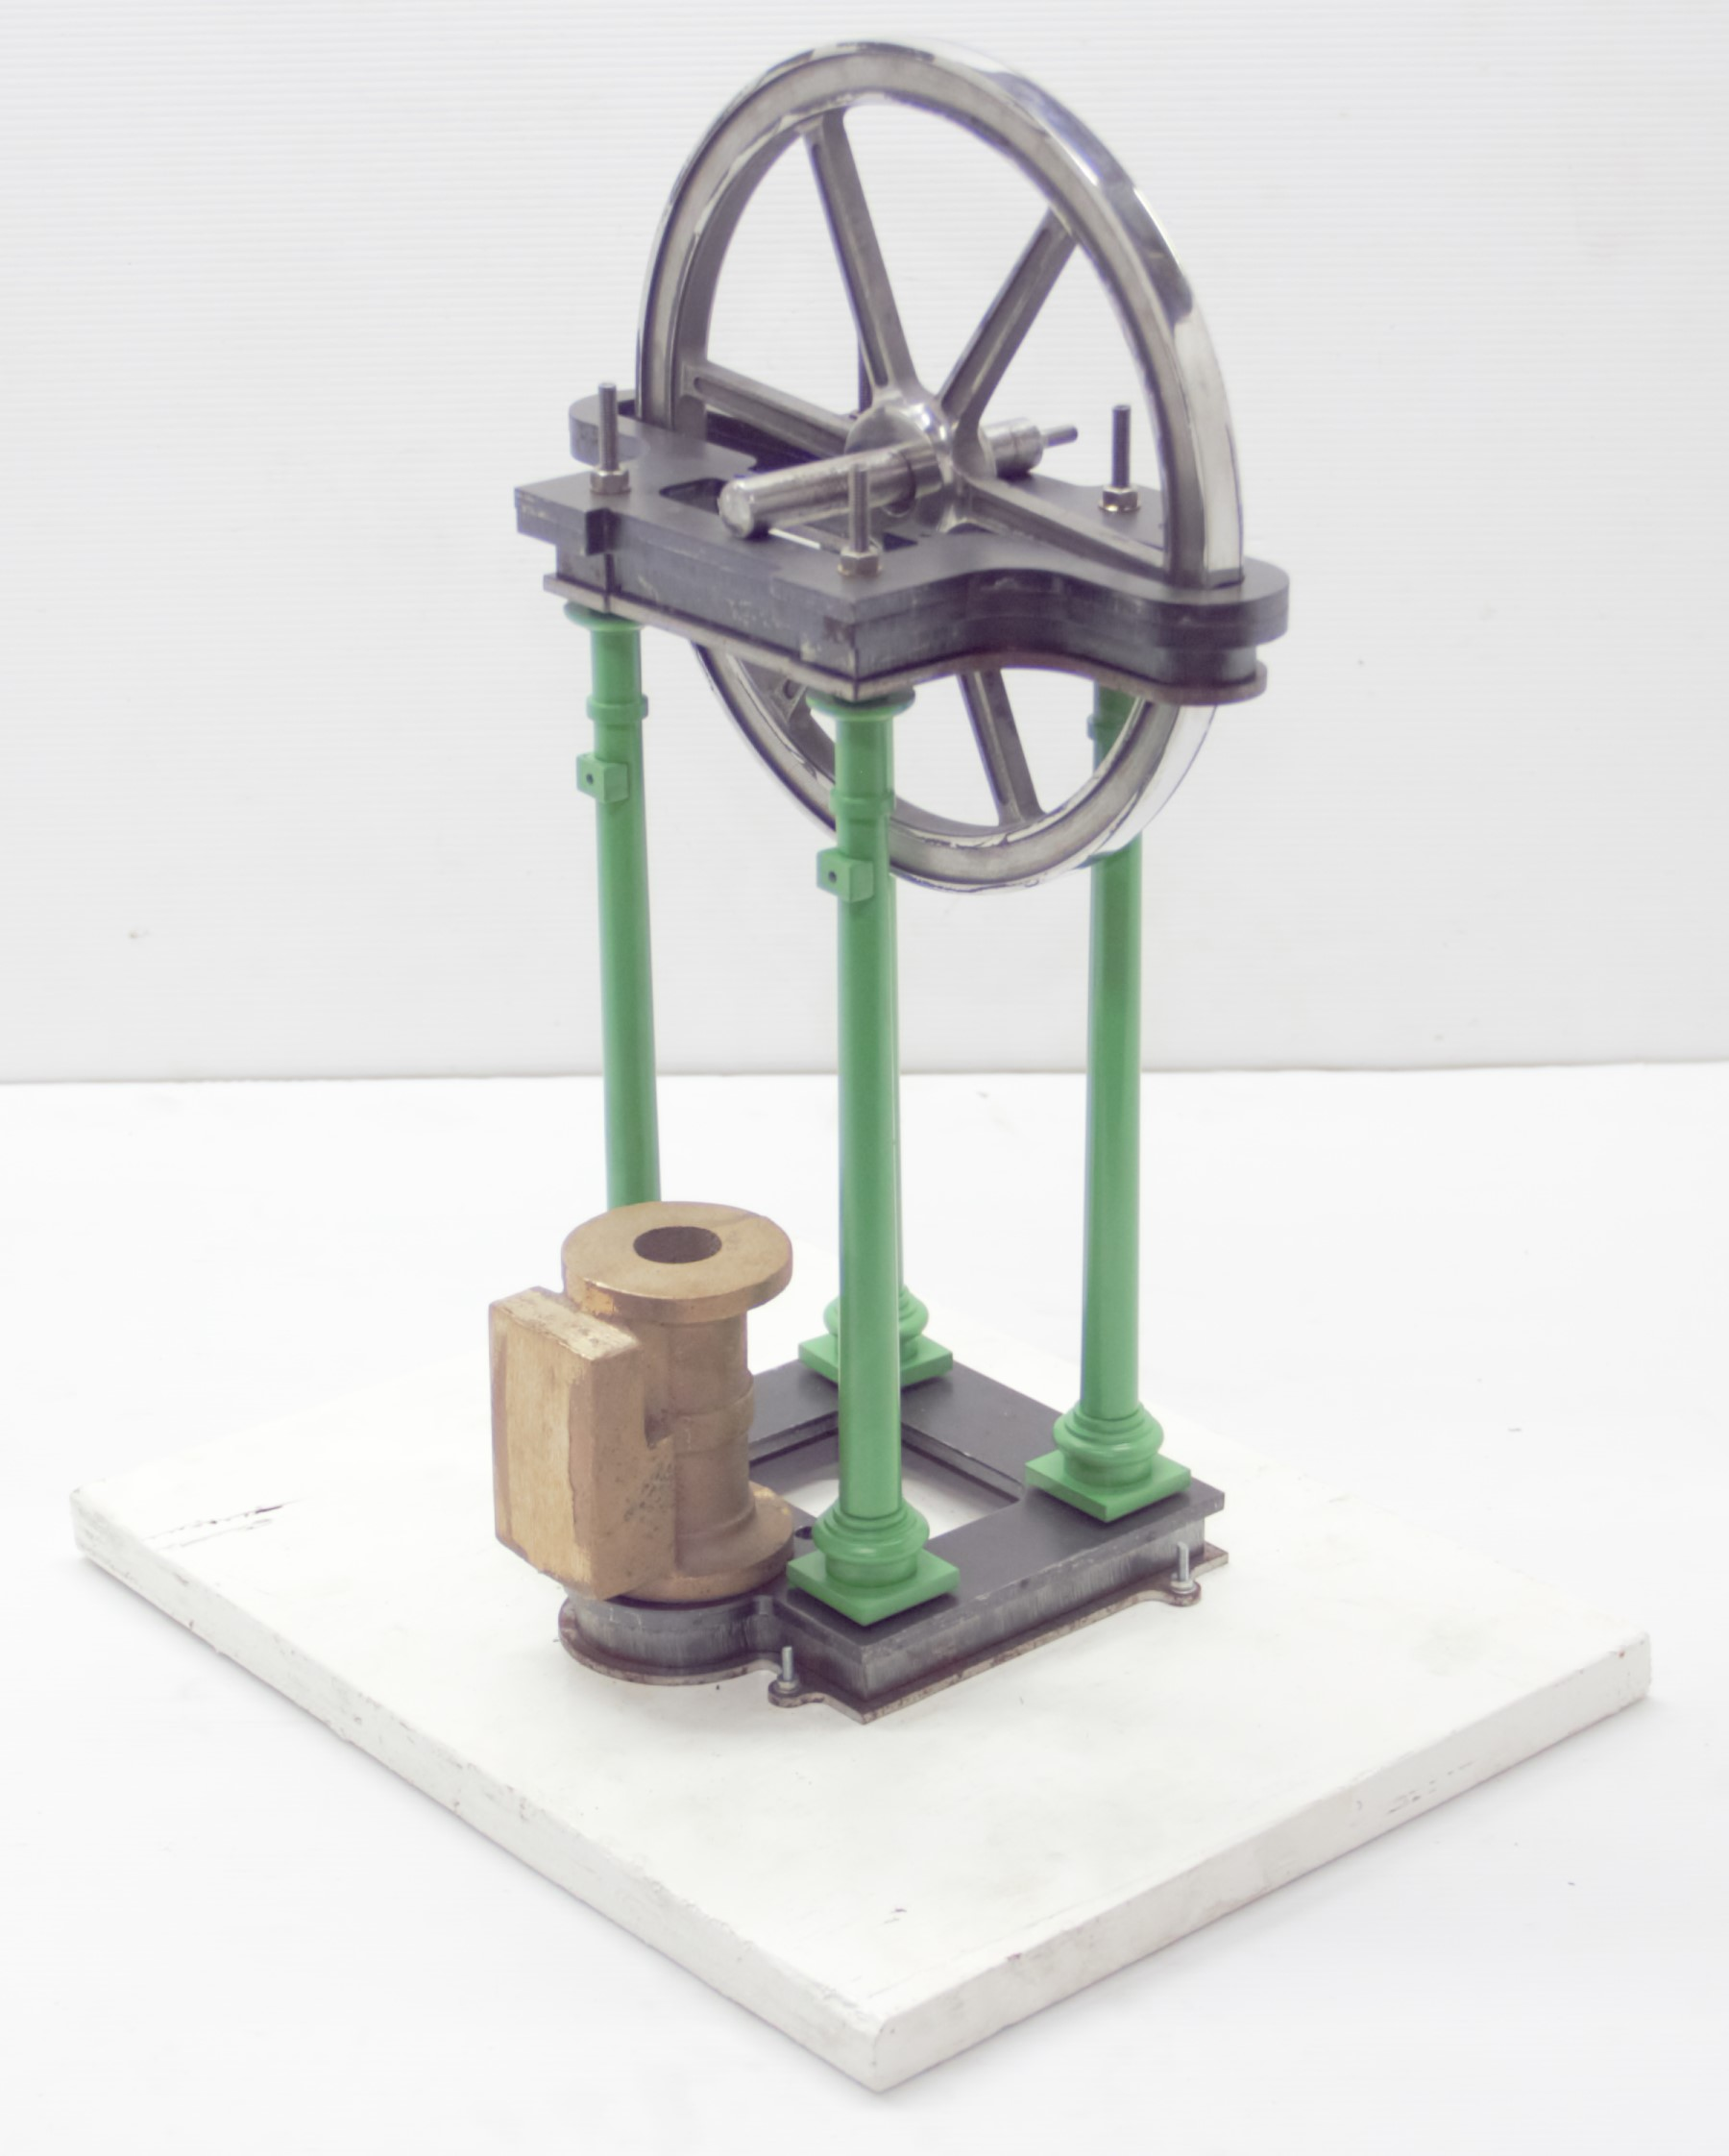 Photo showing Thailand Model Engineer's Overcrank Engine Model Columns Assembled